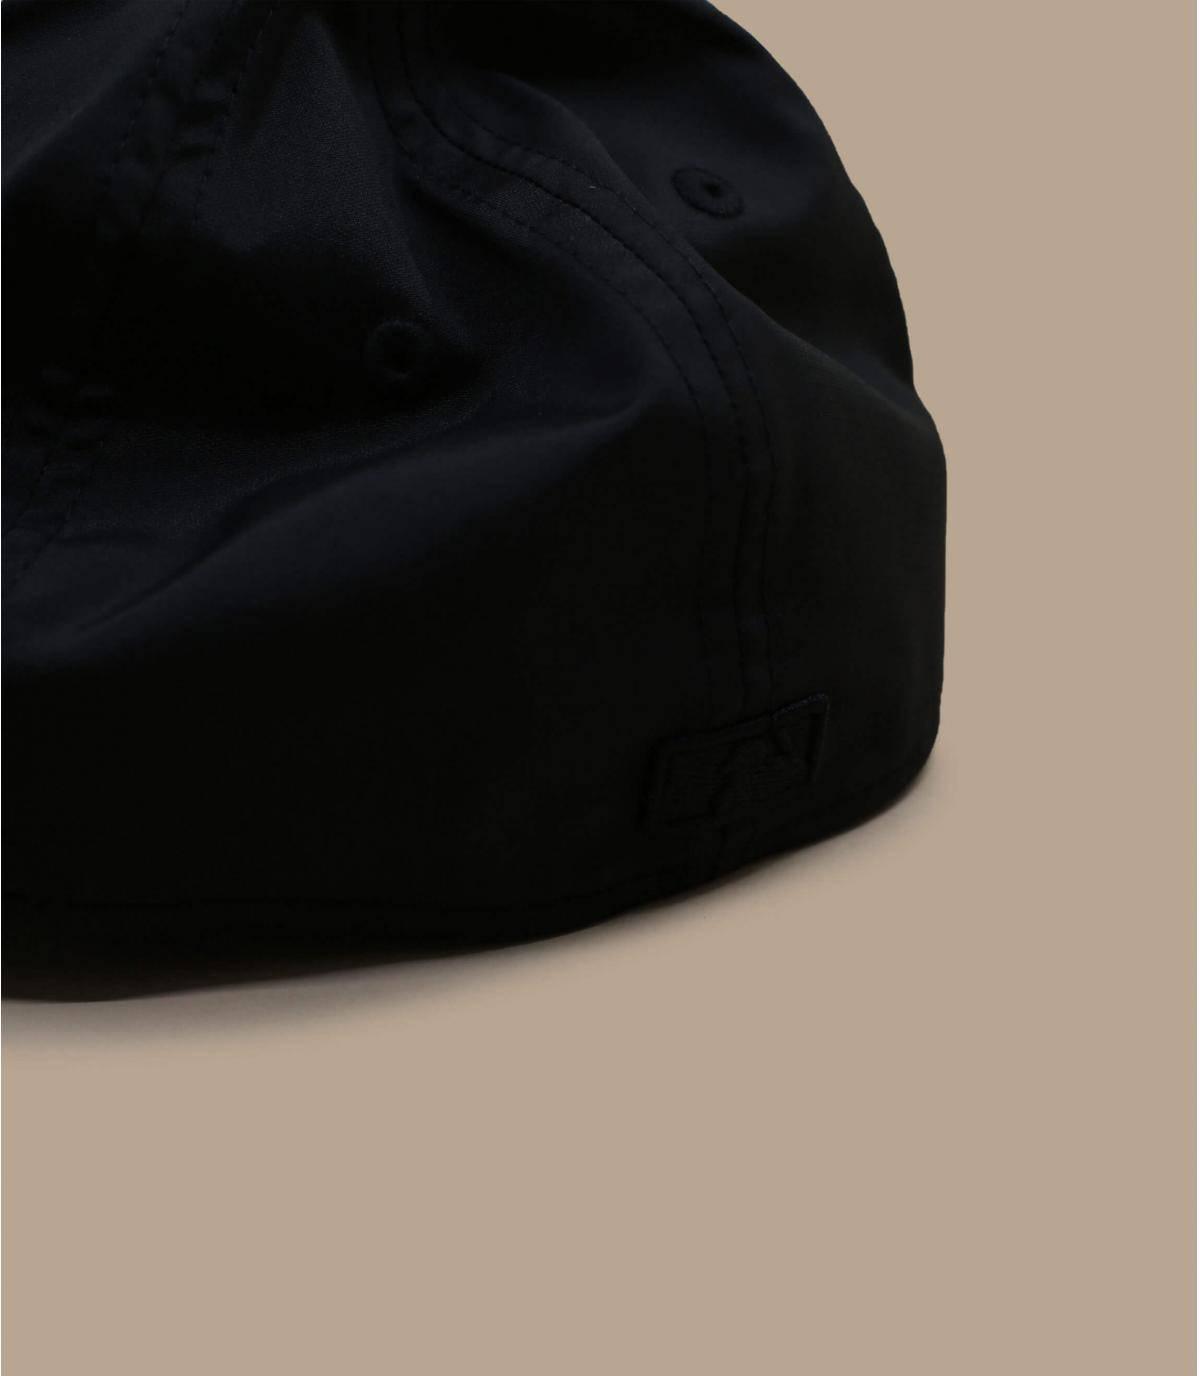 Details Black Camo 3930 NY - afbeeling 4